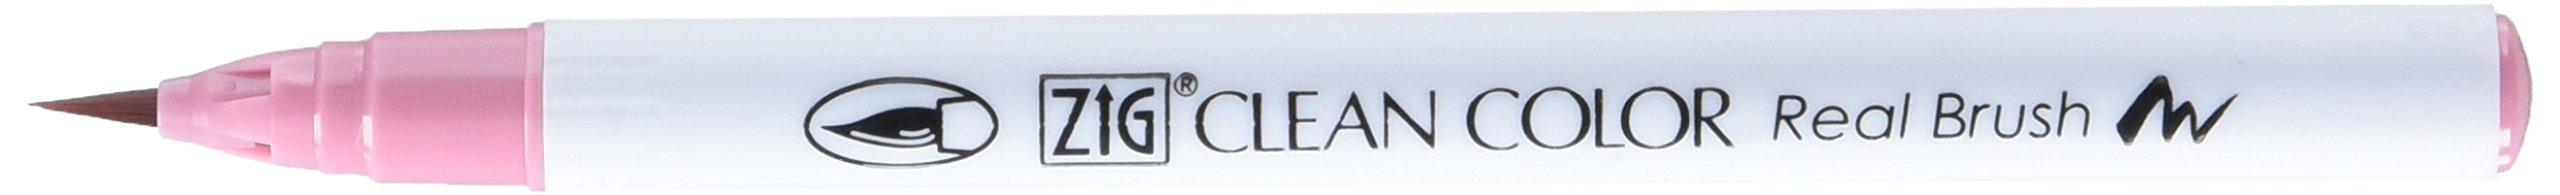 Zig RB6000AT-230 Clean Color Real Brush Marker, Pale Rose